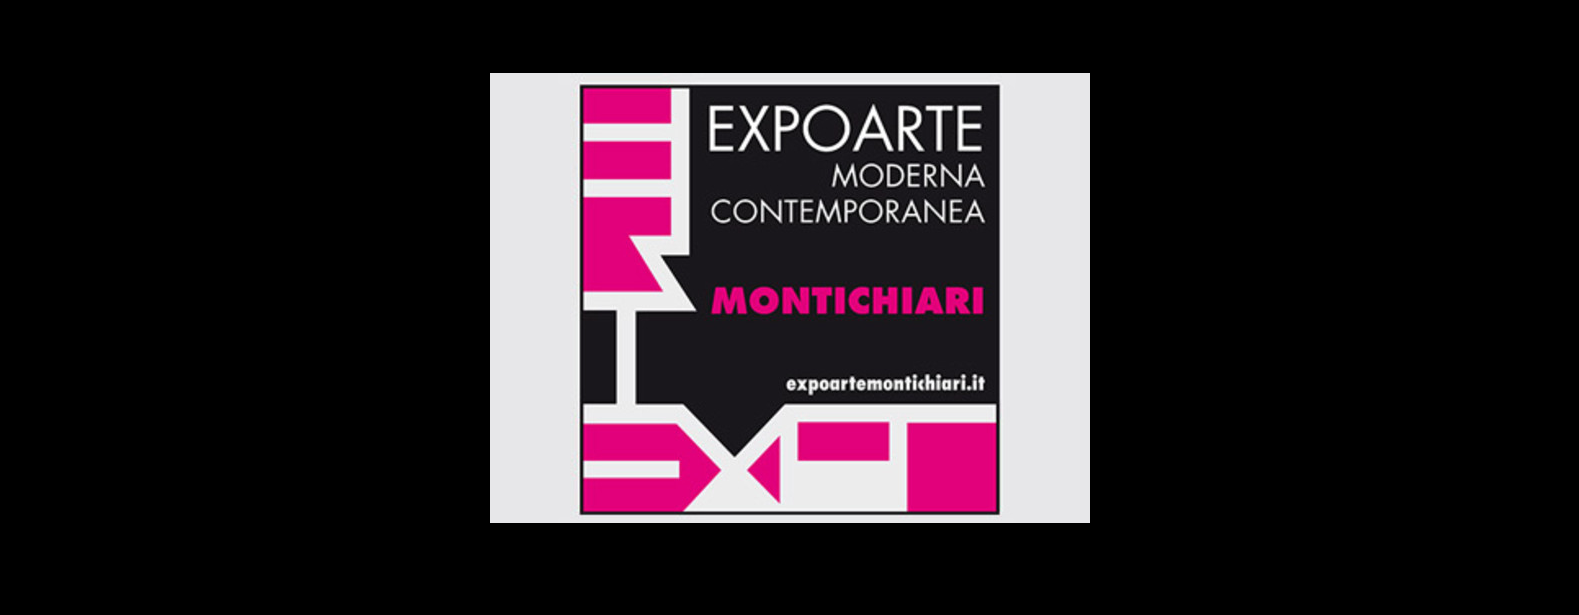 EXPOARTE MONTICHIARI 2020 Arte moderna e contemporanea